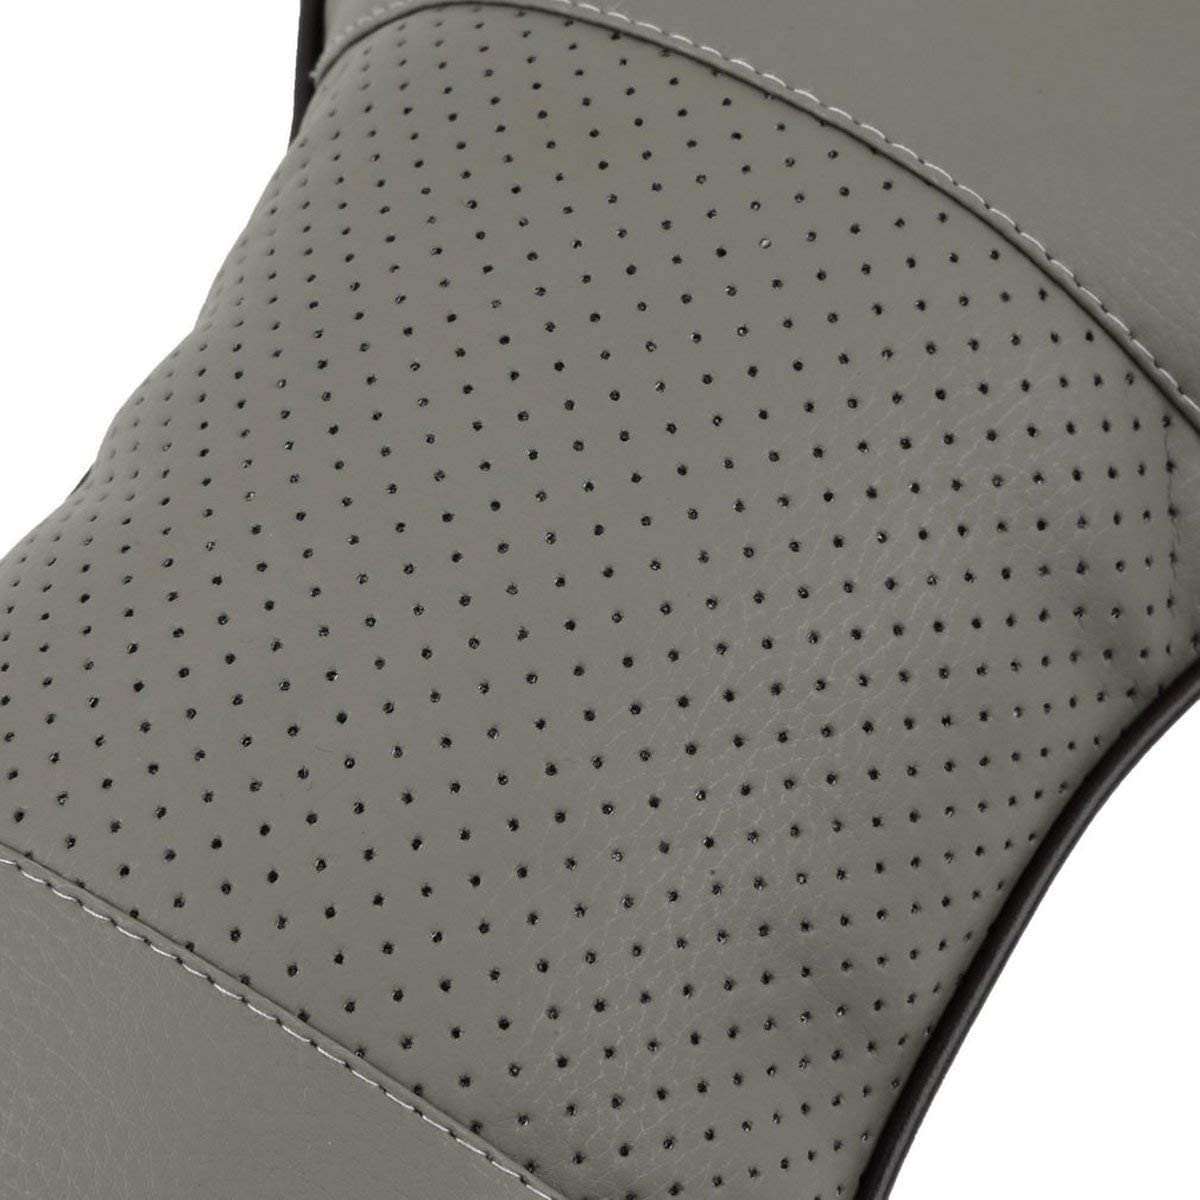 Gugutogo Universal Solid Bone Shape Headrest Pillow Breathable PU Leather Cloth Car Head Neck Rest Cushion Auto Interior Accessories